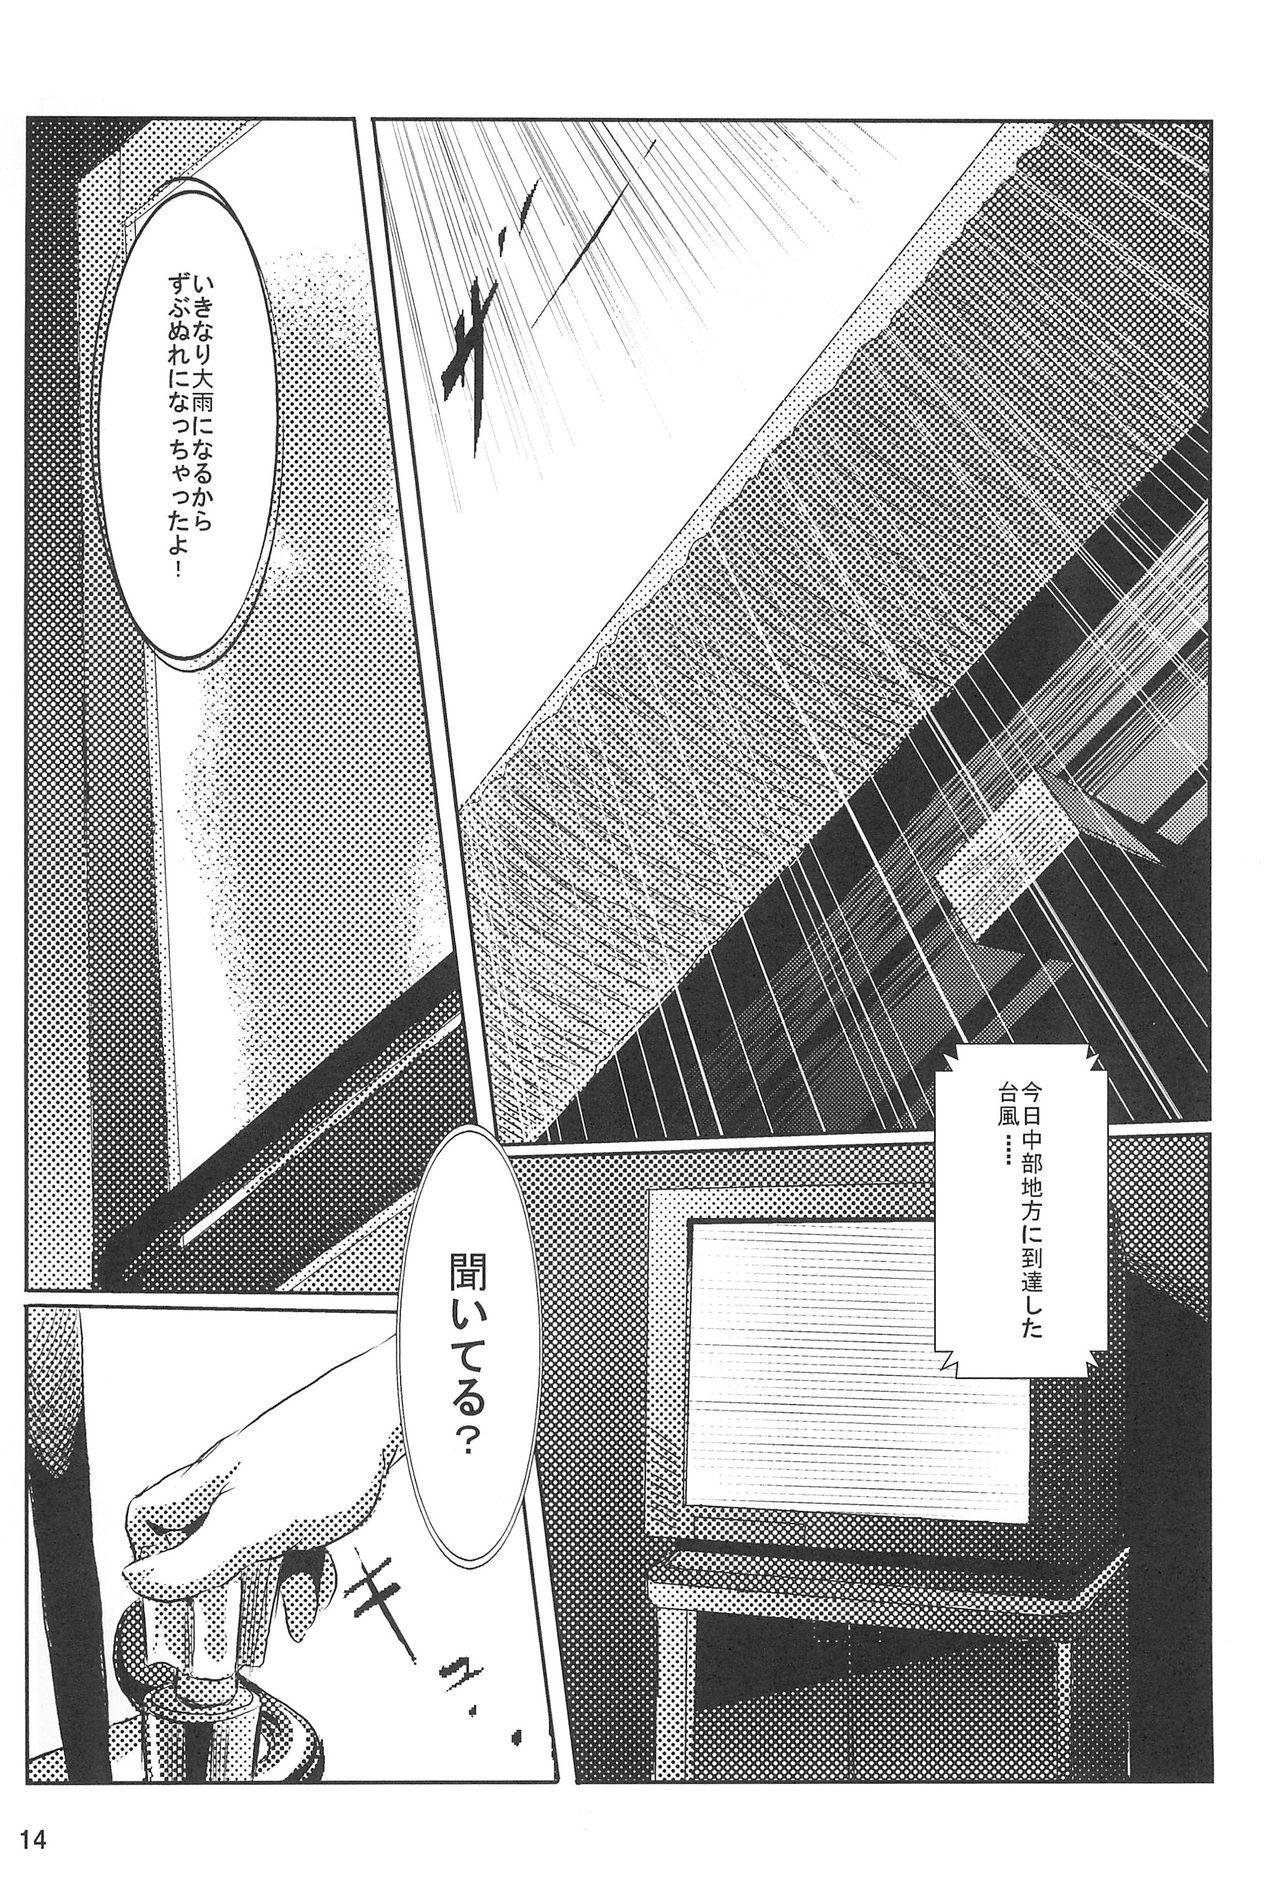 ) Mitsukushi 17